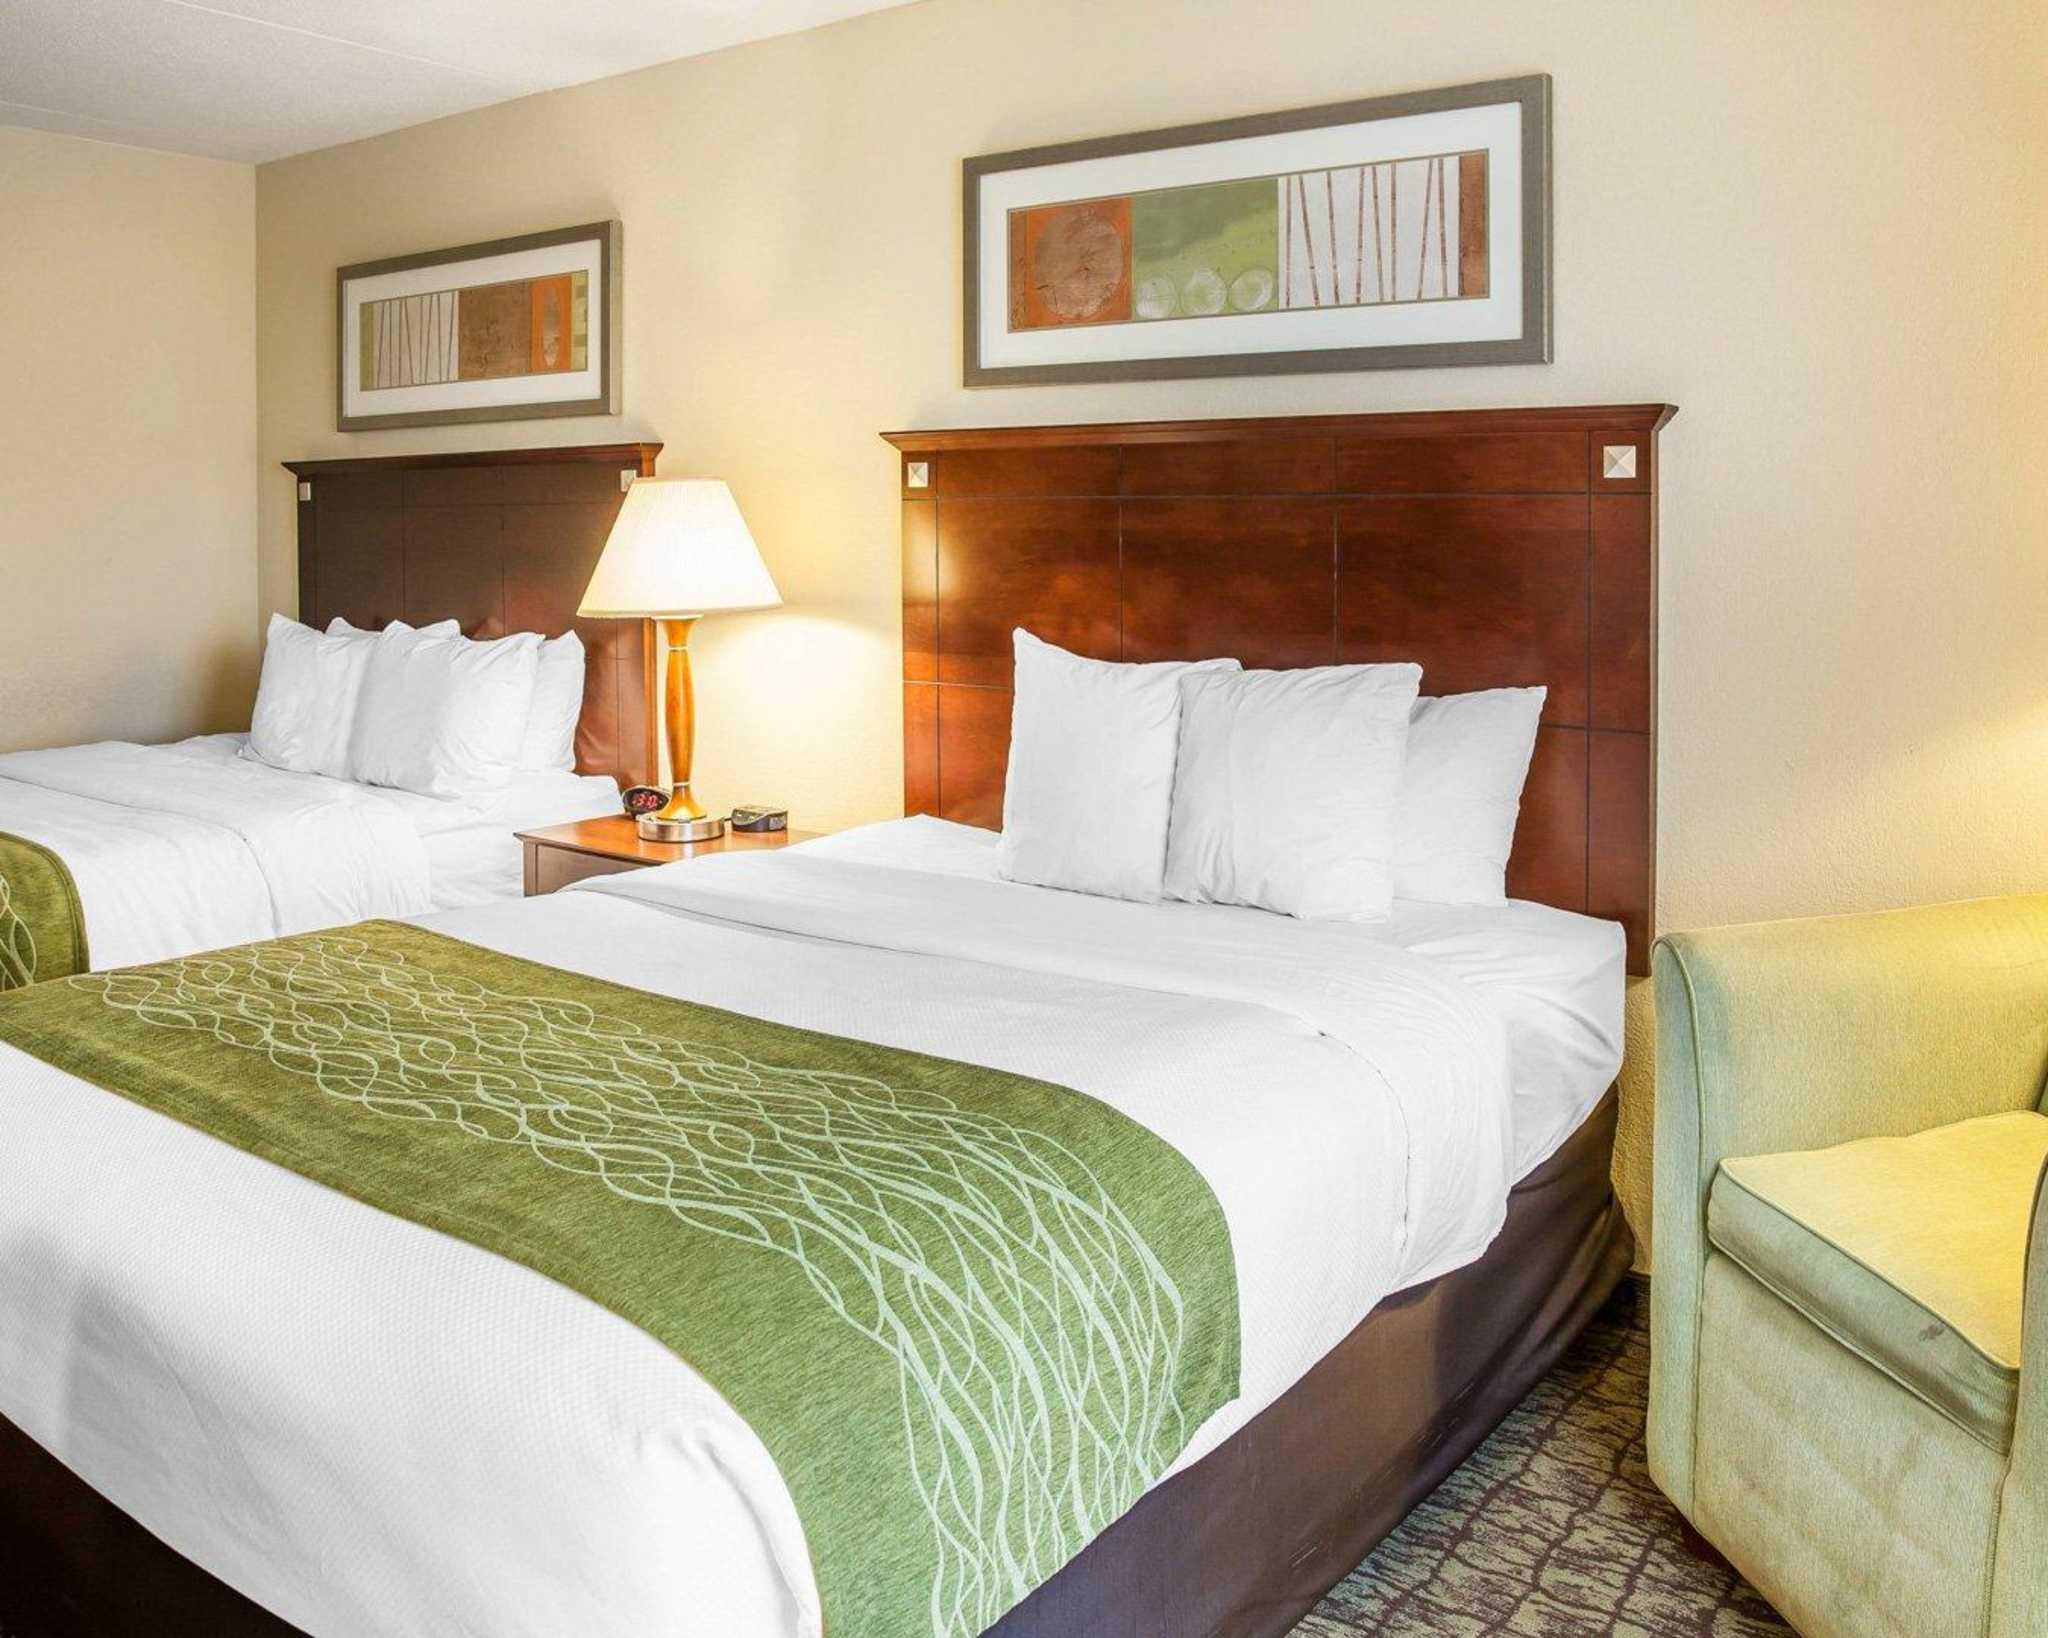 Comfort Inn & Suites Pottstown - Limerick in Pottstown, PA ...